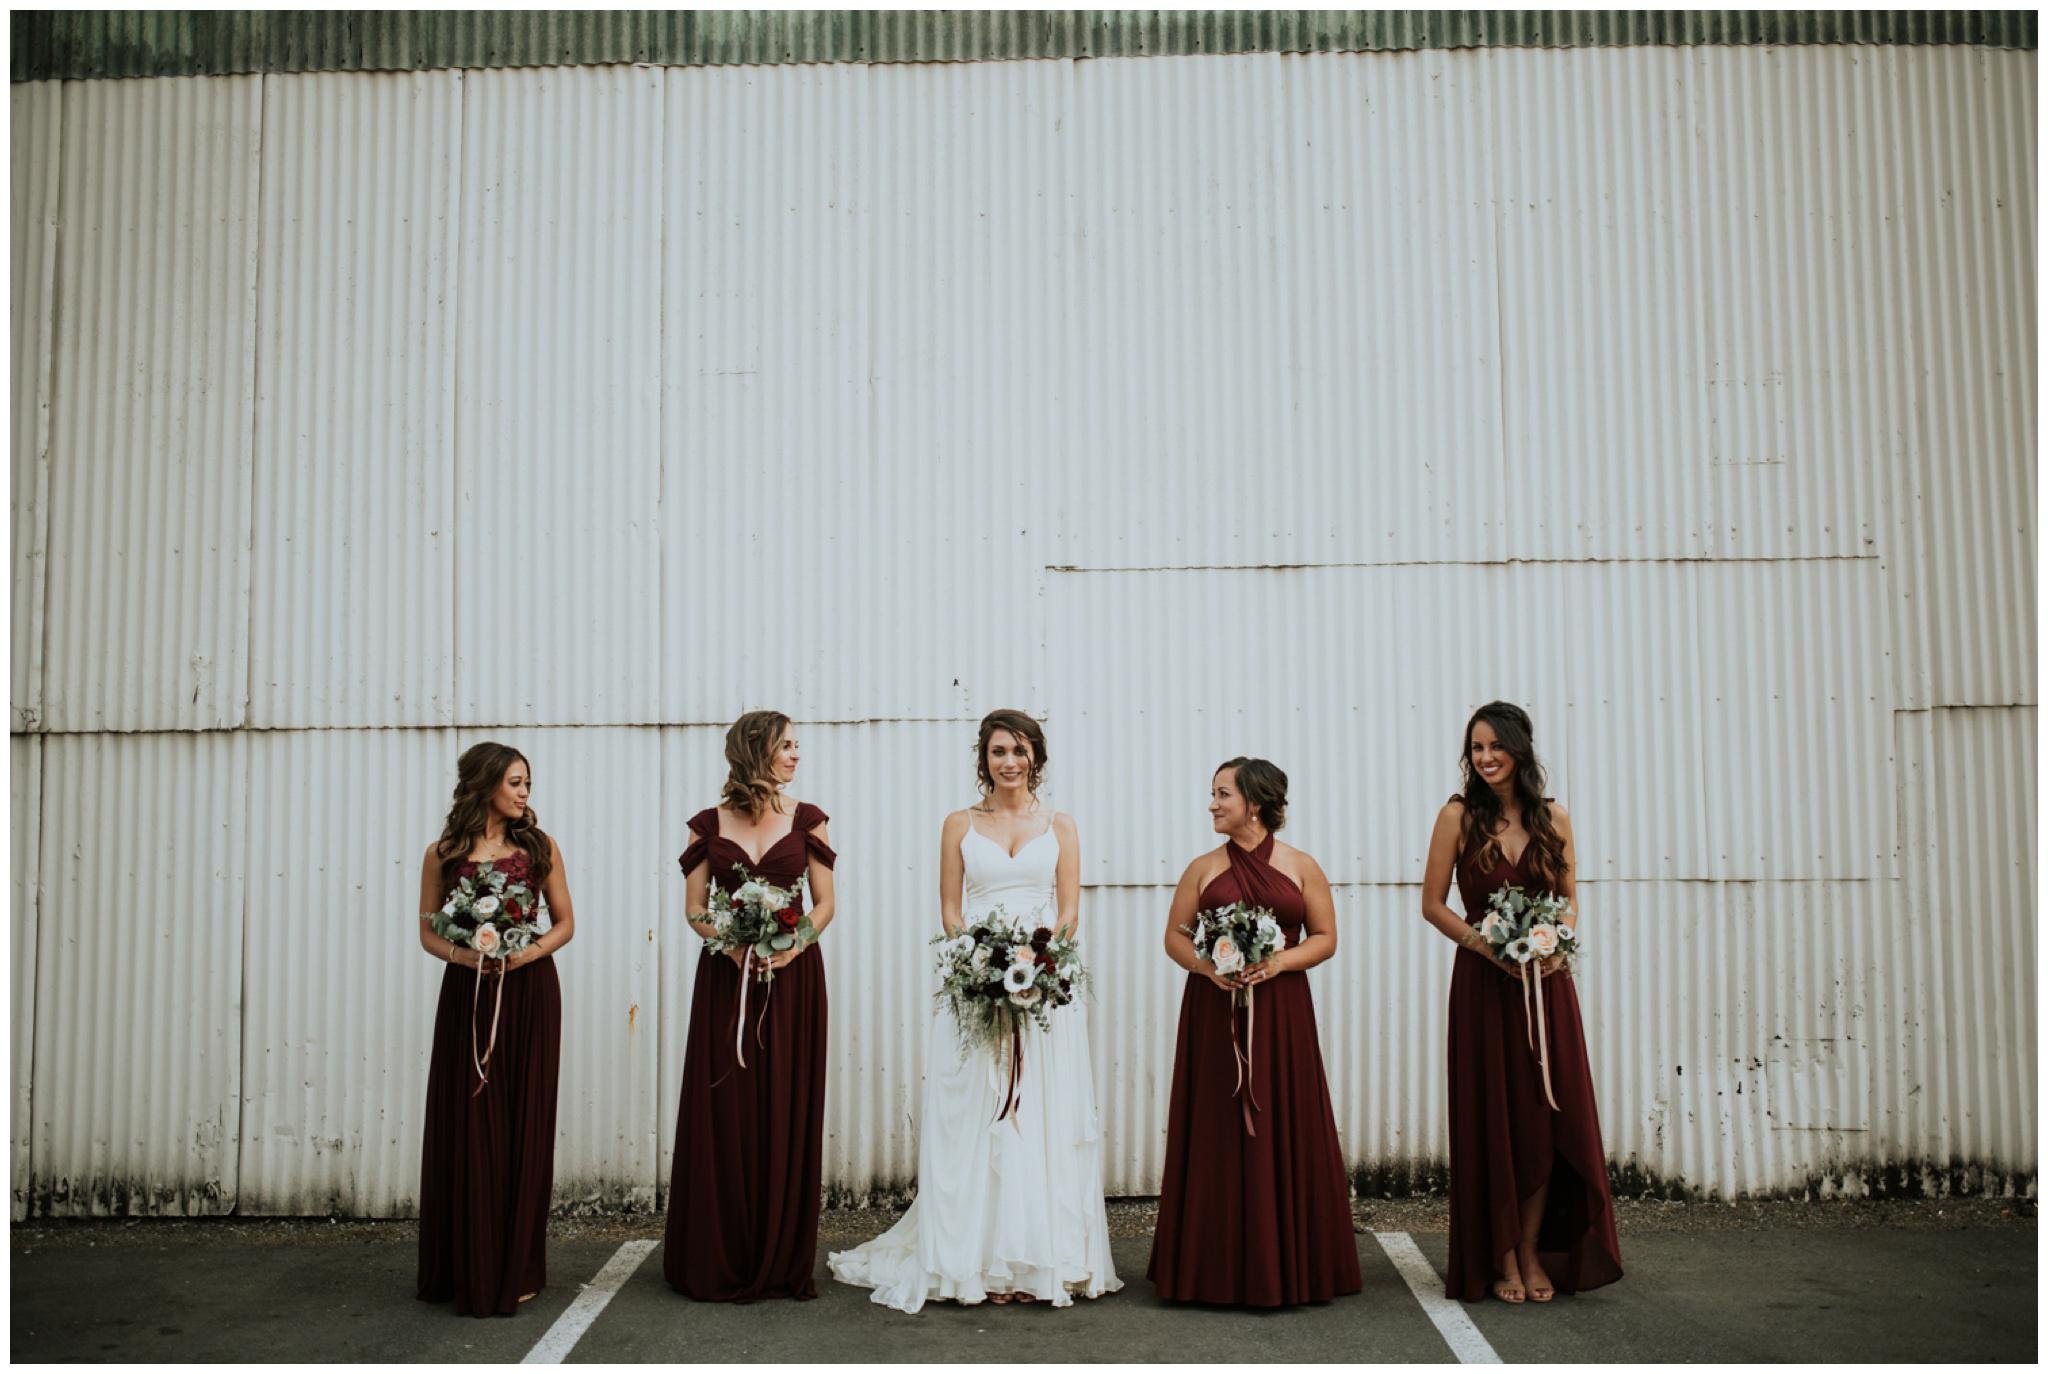 alyssa-keiran-westland-distillery-urban-seattle-wedding-photographer-caitlyn-nikula-84.jpg